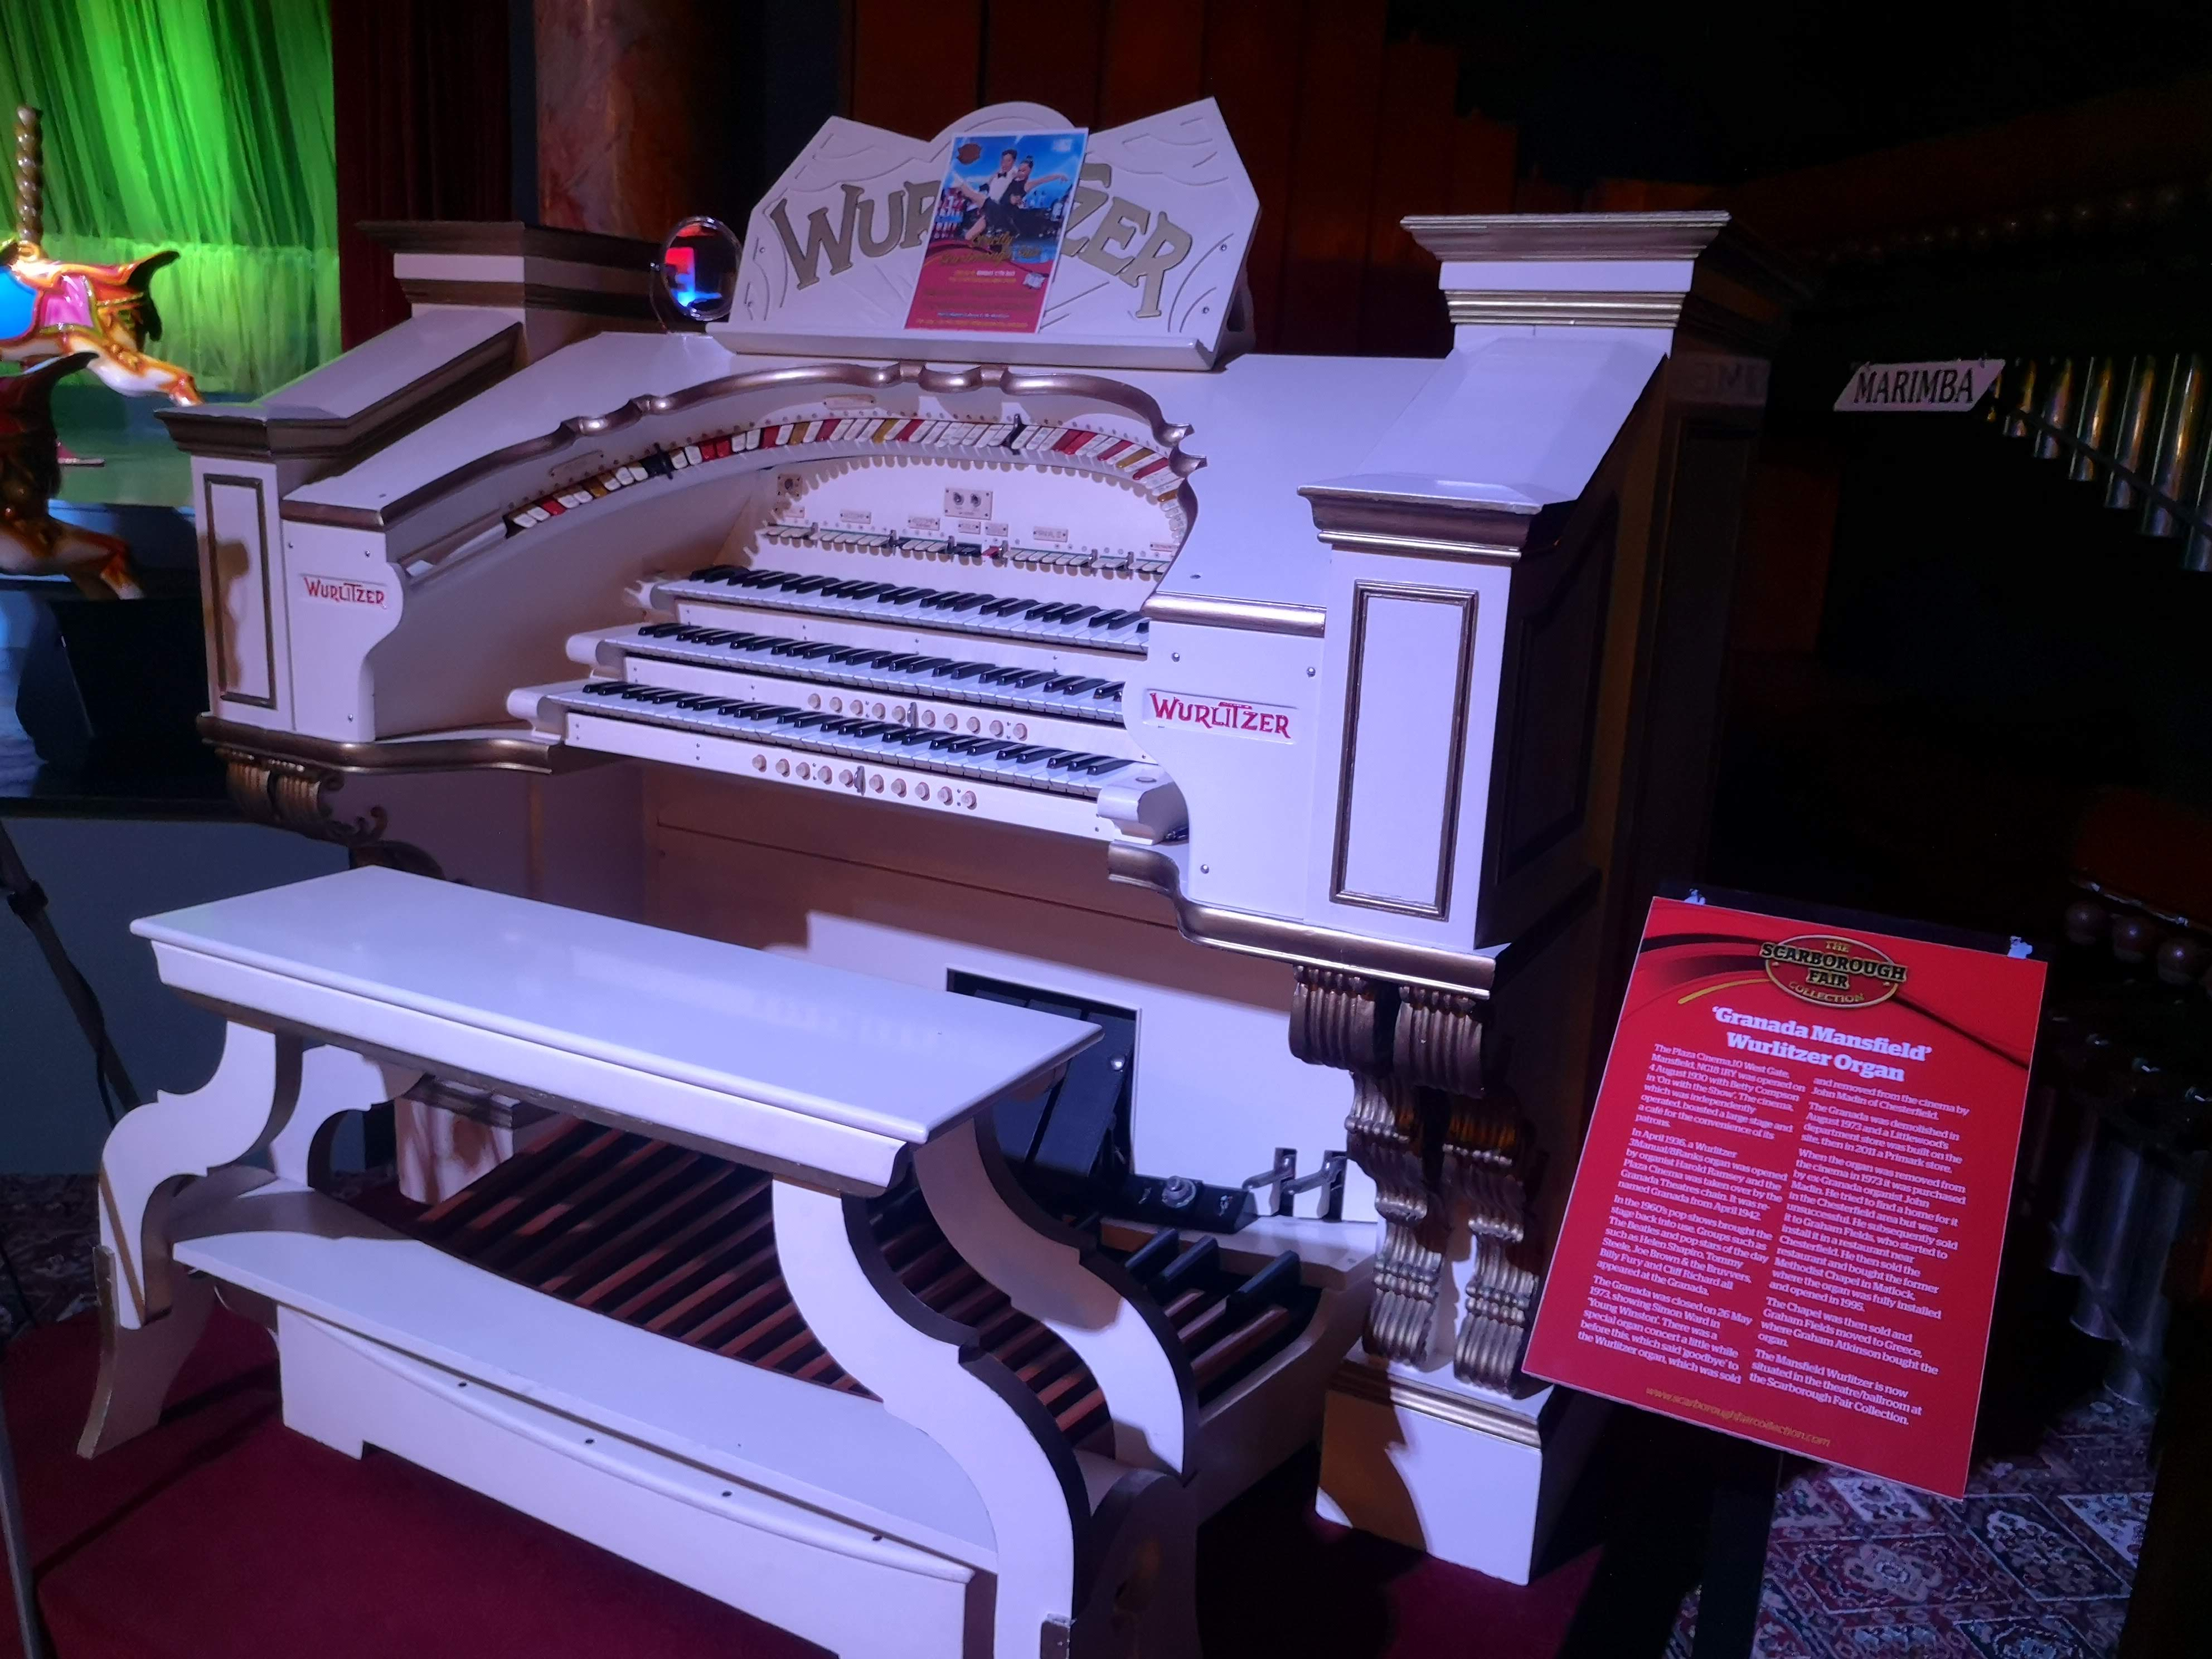 A large, white Wurlitzer organ